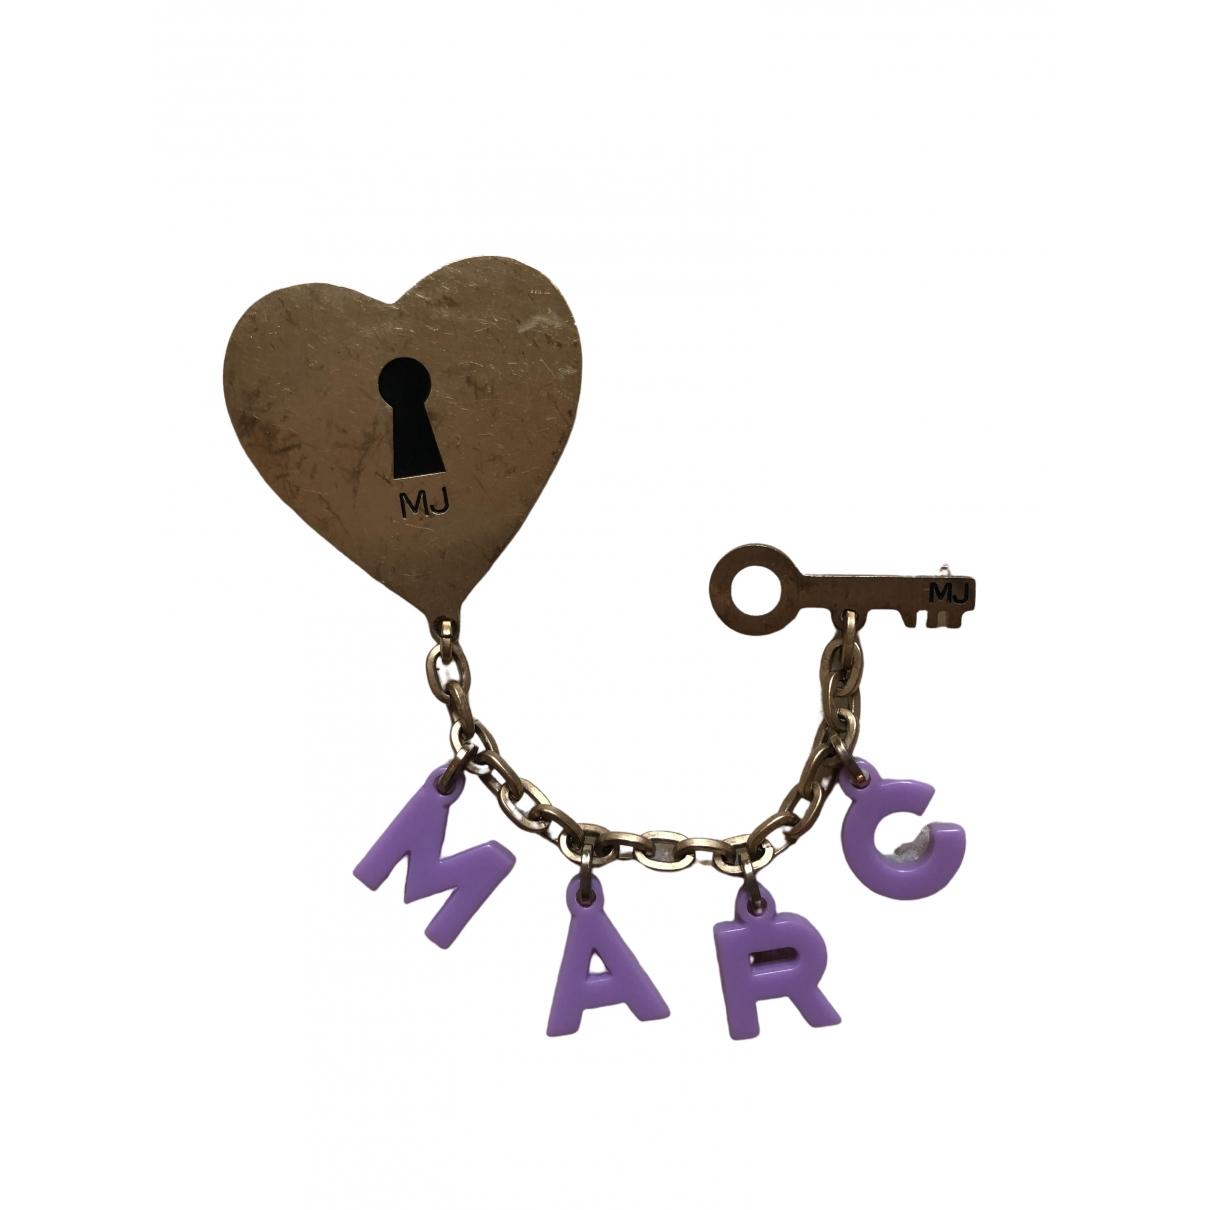 Broche en Metal Dorado Marc Jacobs